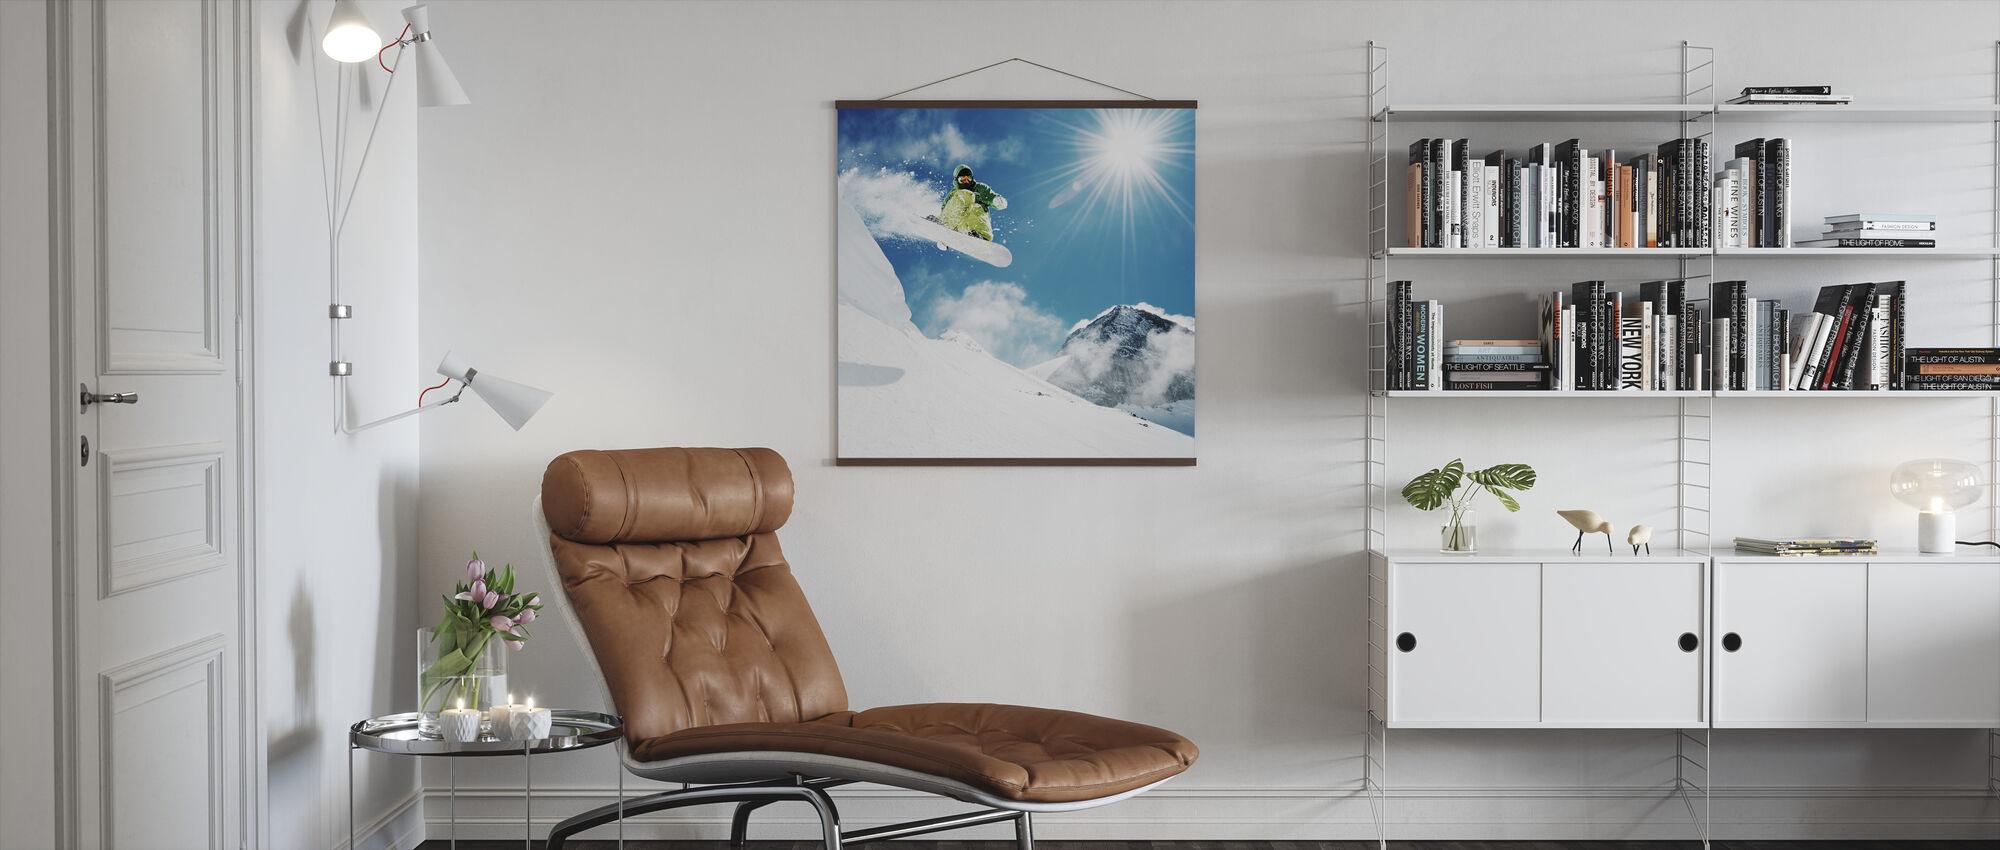 Snowboarder på Jump - Poster - Vardagsrum